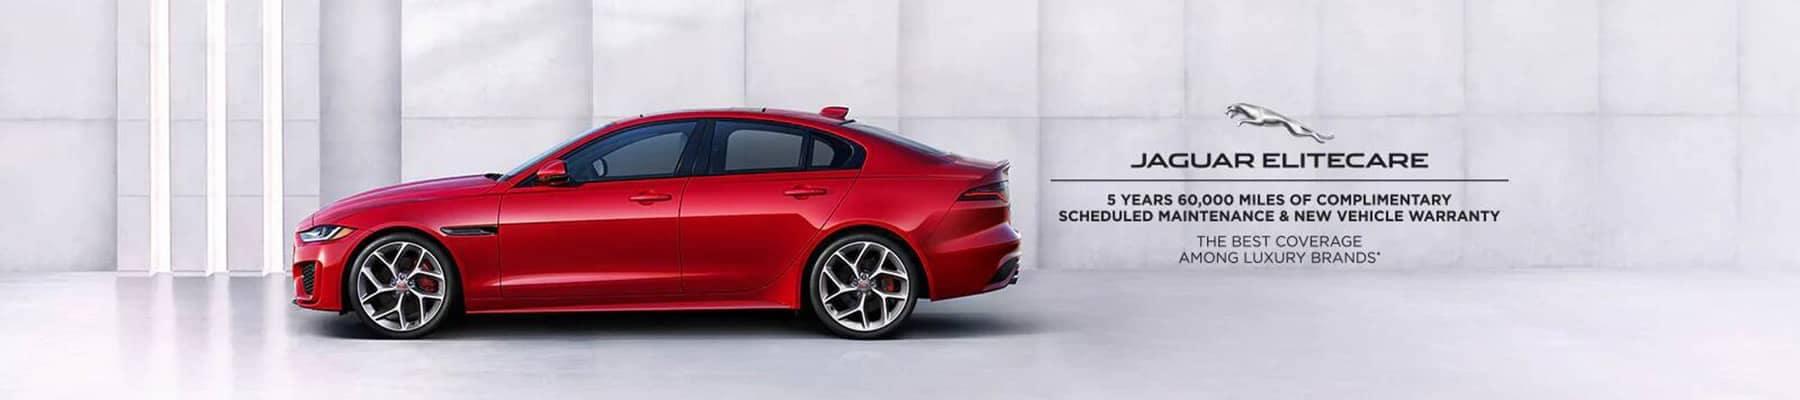 Jaguar EliteCare Warranty